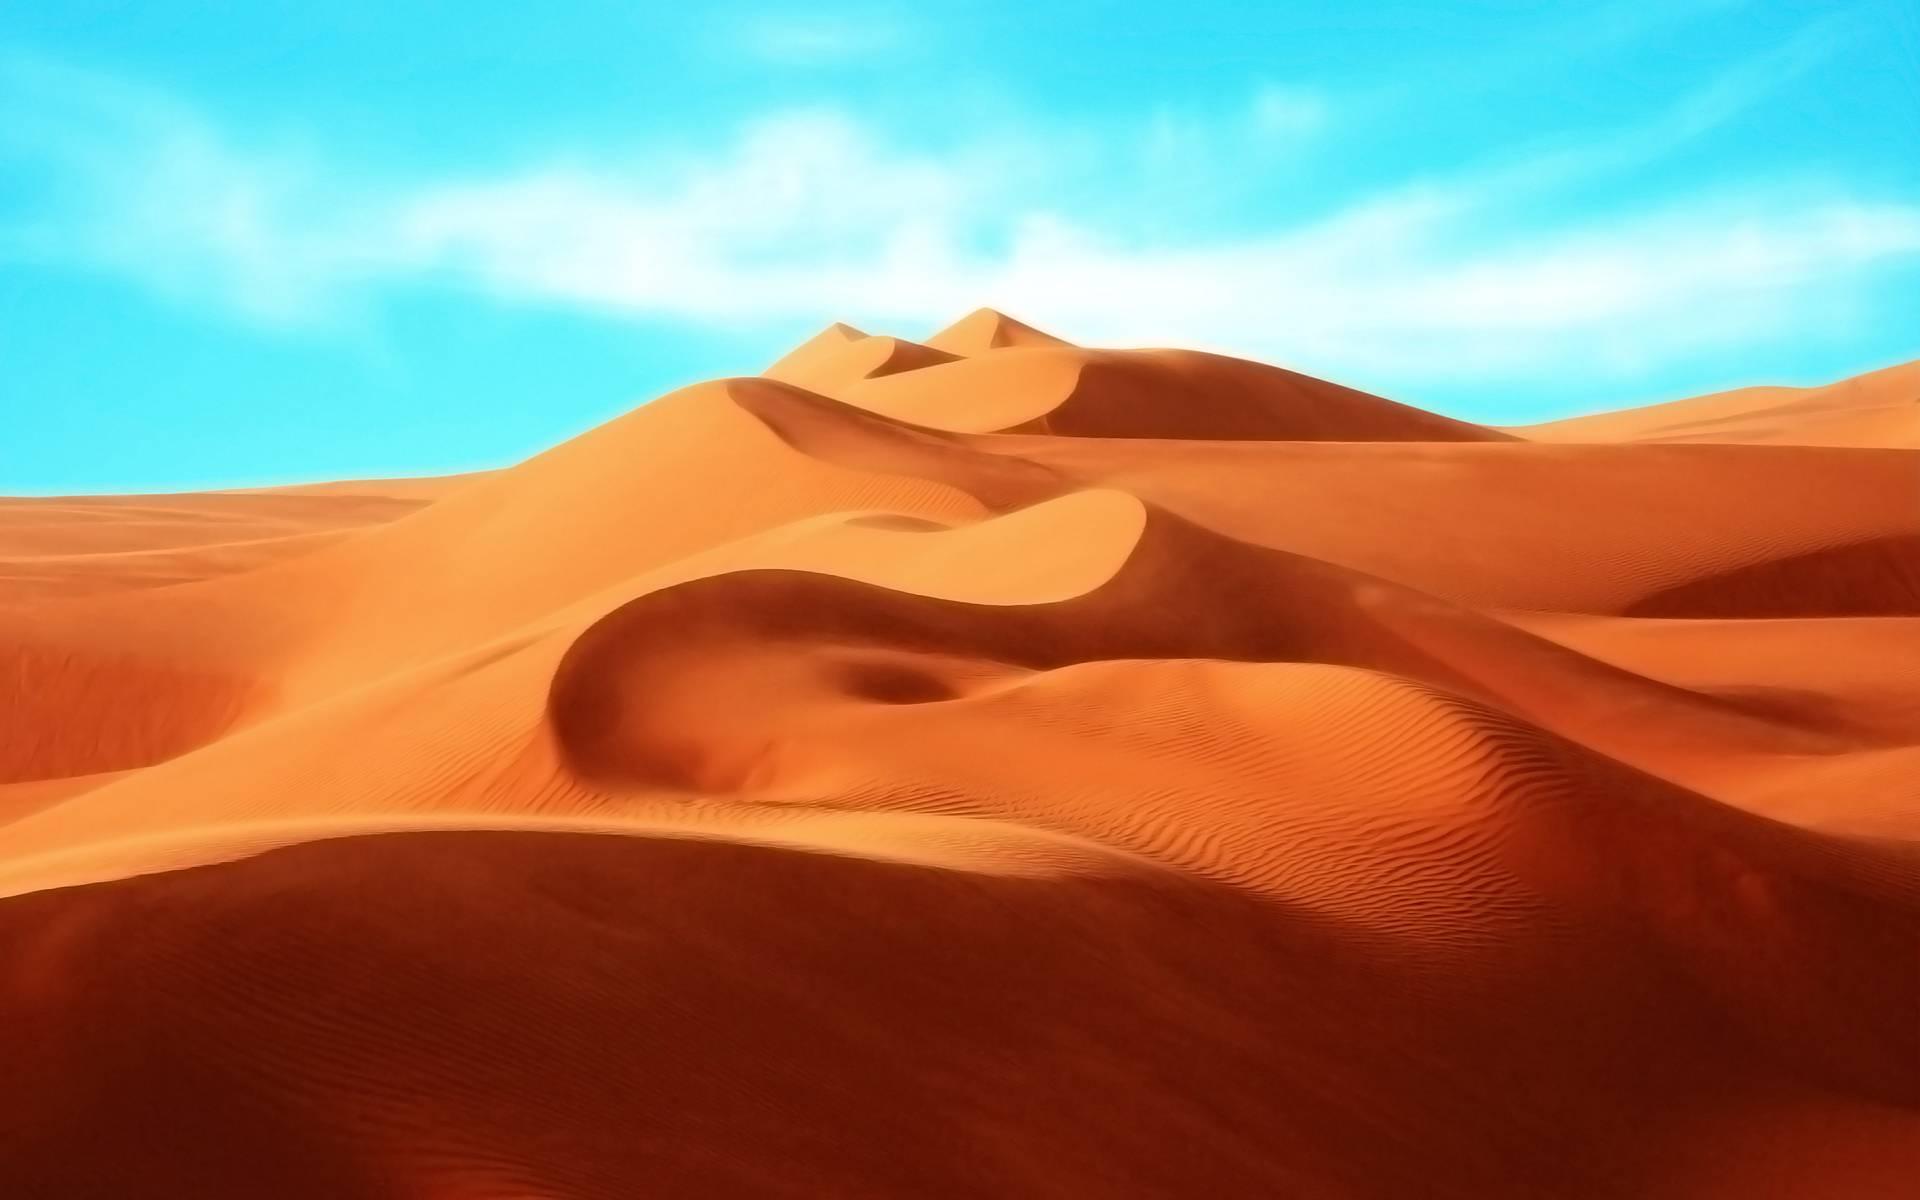 барханы пустыня дюны  № 1291815 без смс